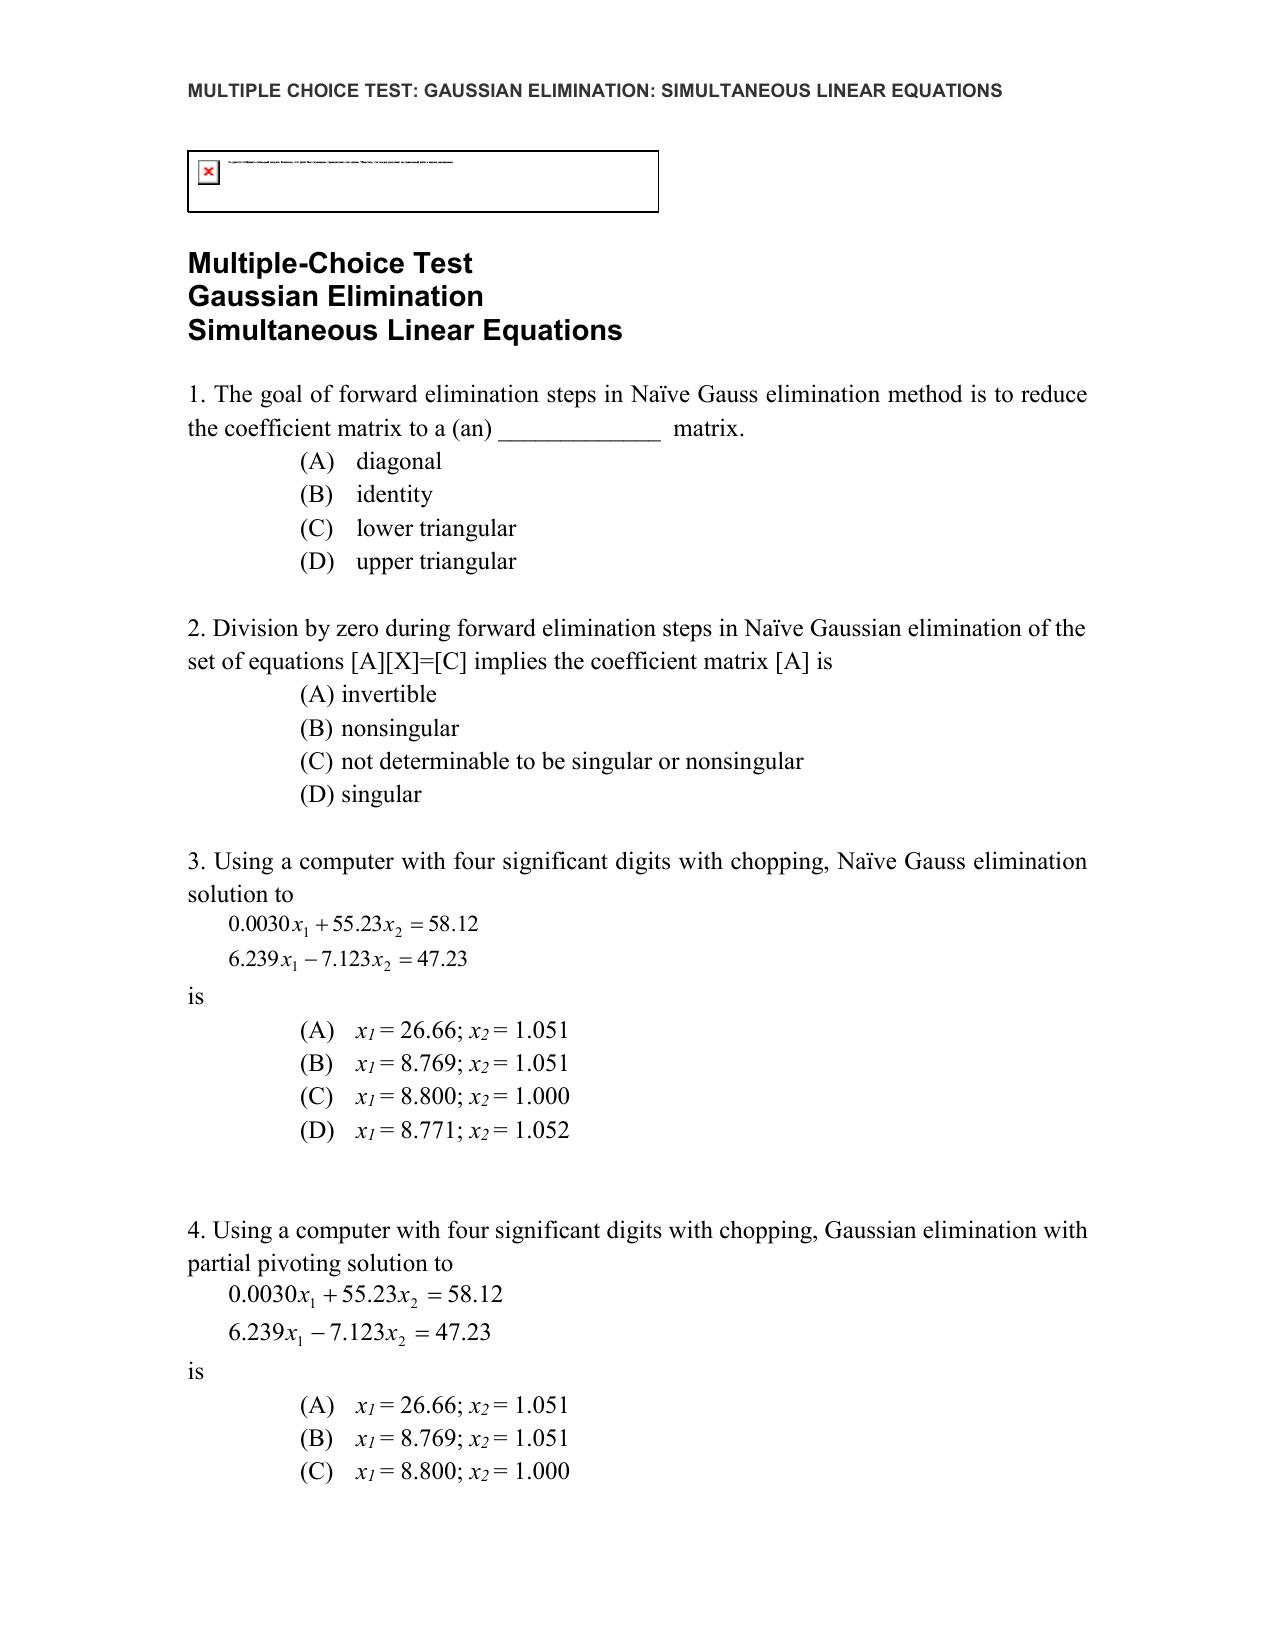 Multiple Choice Test Gaussian Elimination Simultaneous